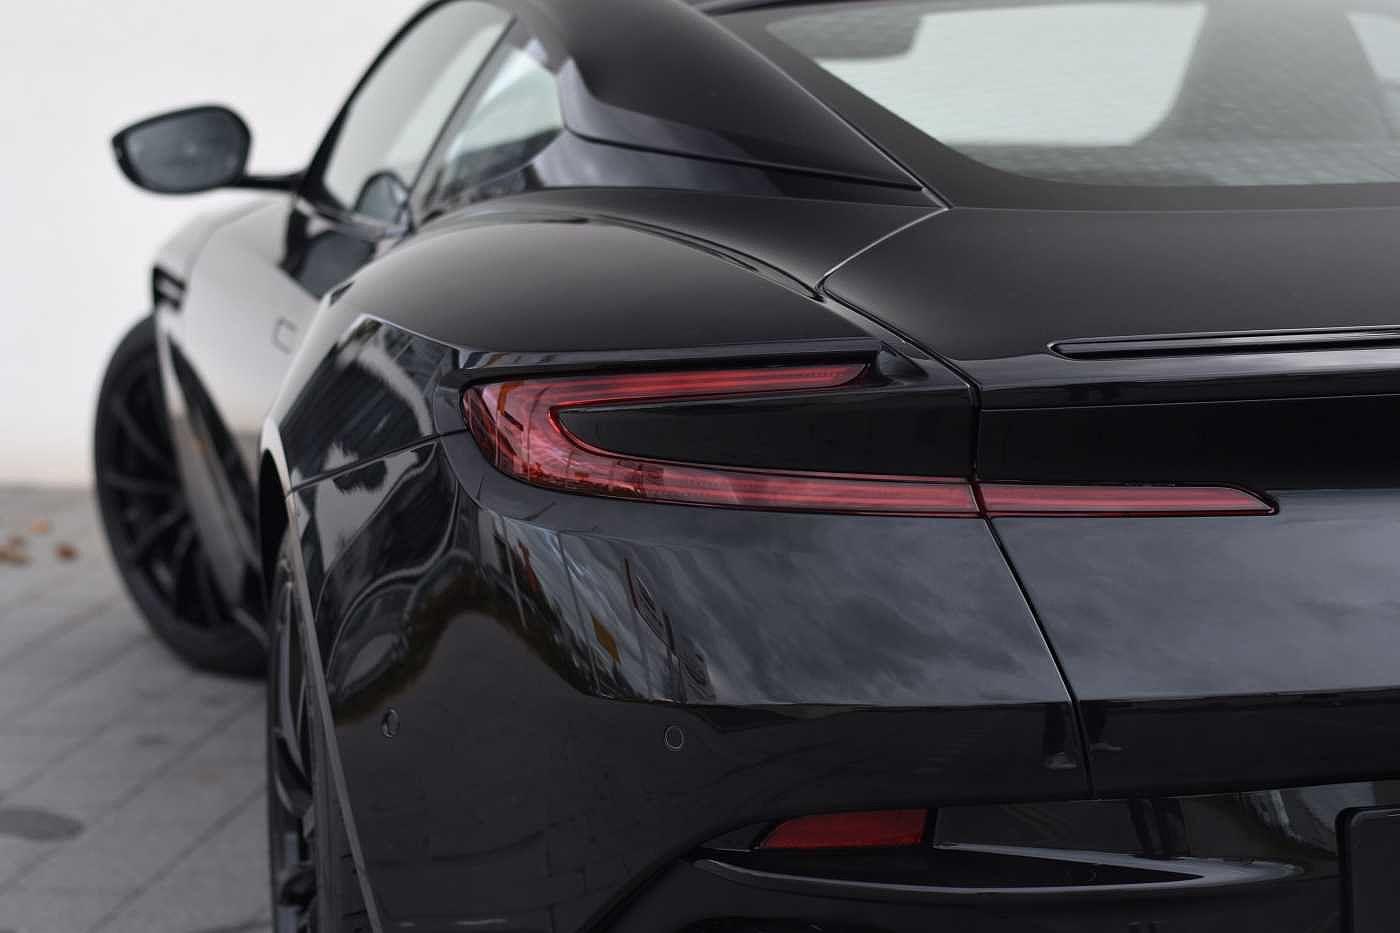 X Aston Martin Db11 V8 Coupe